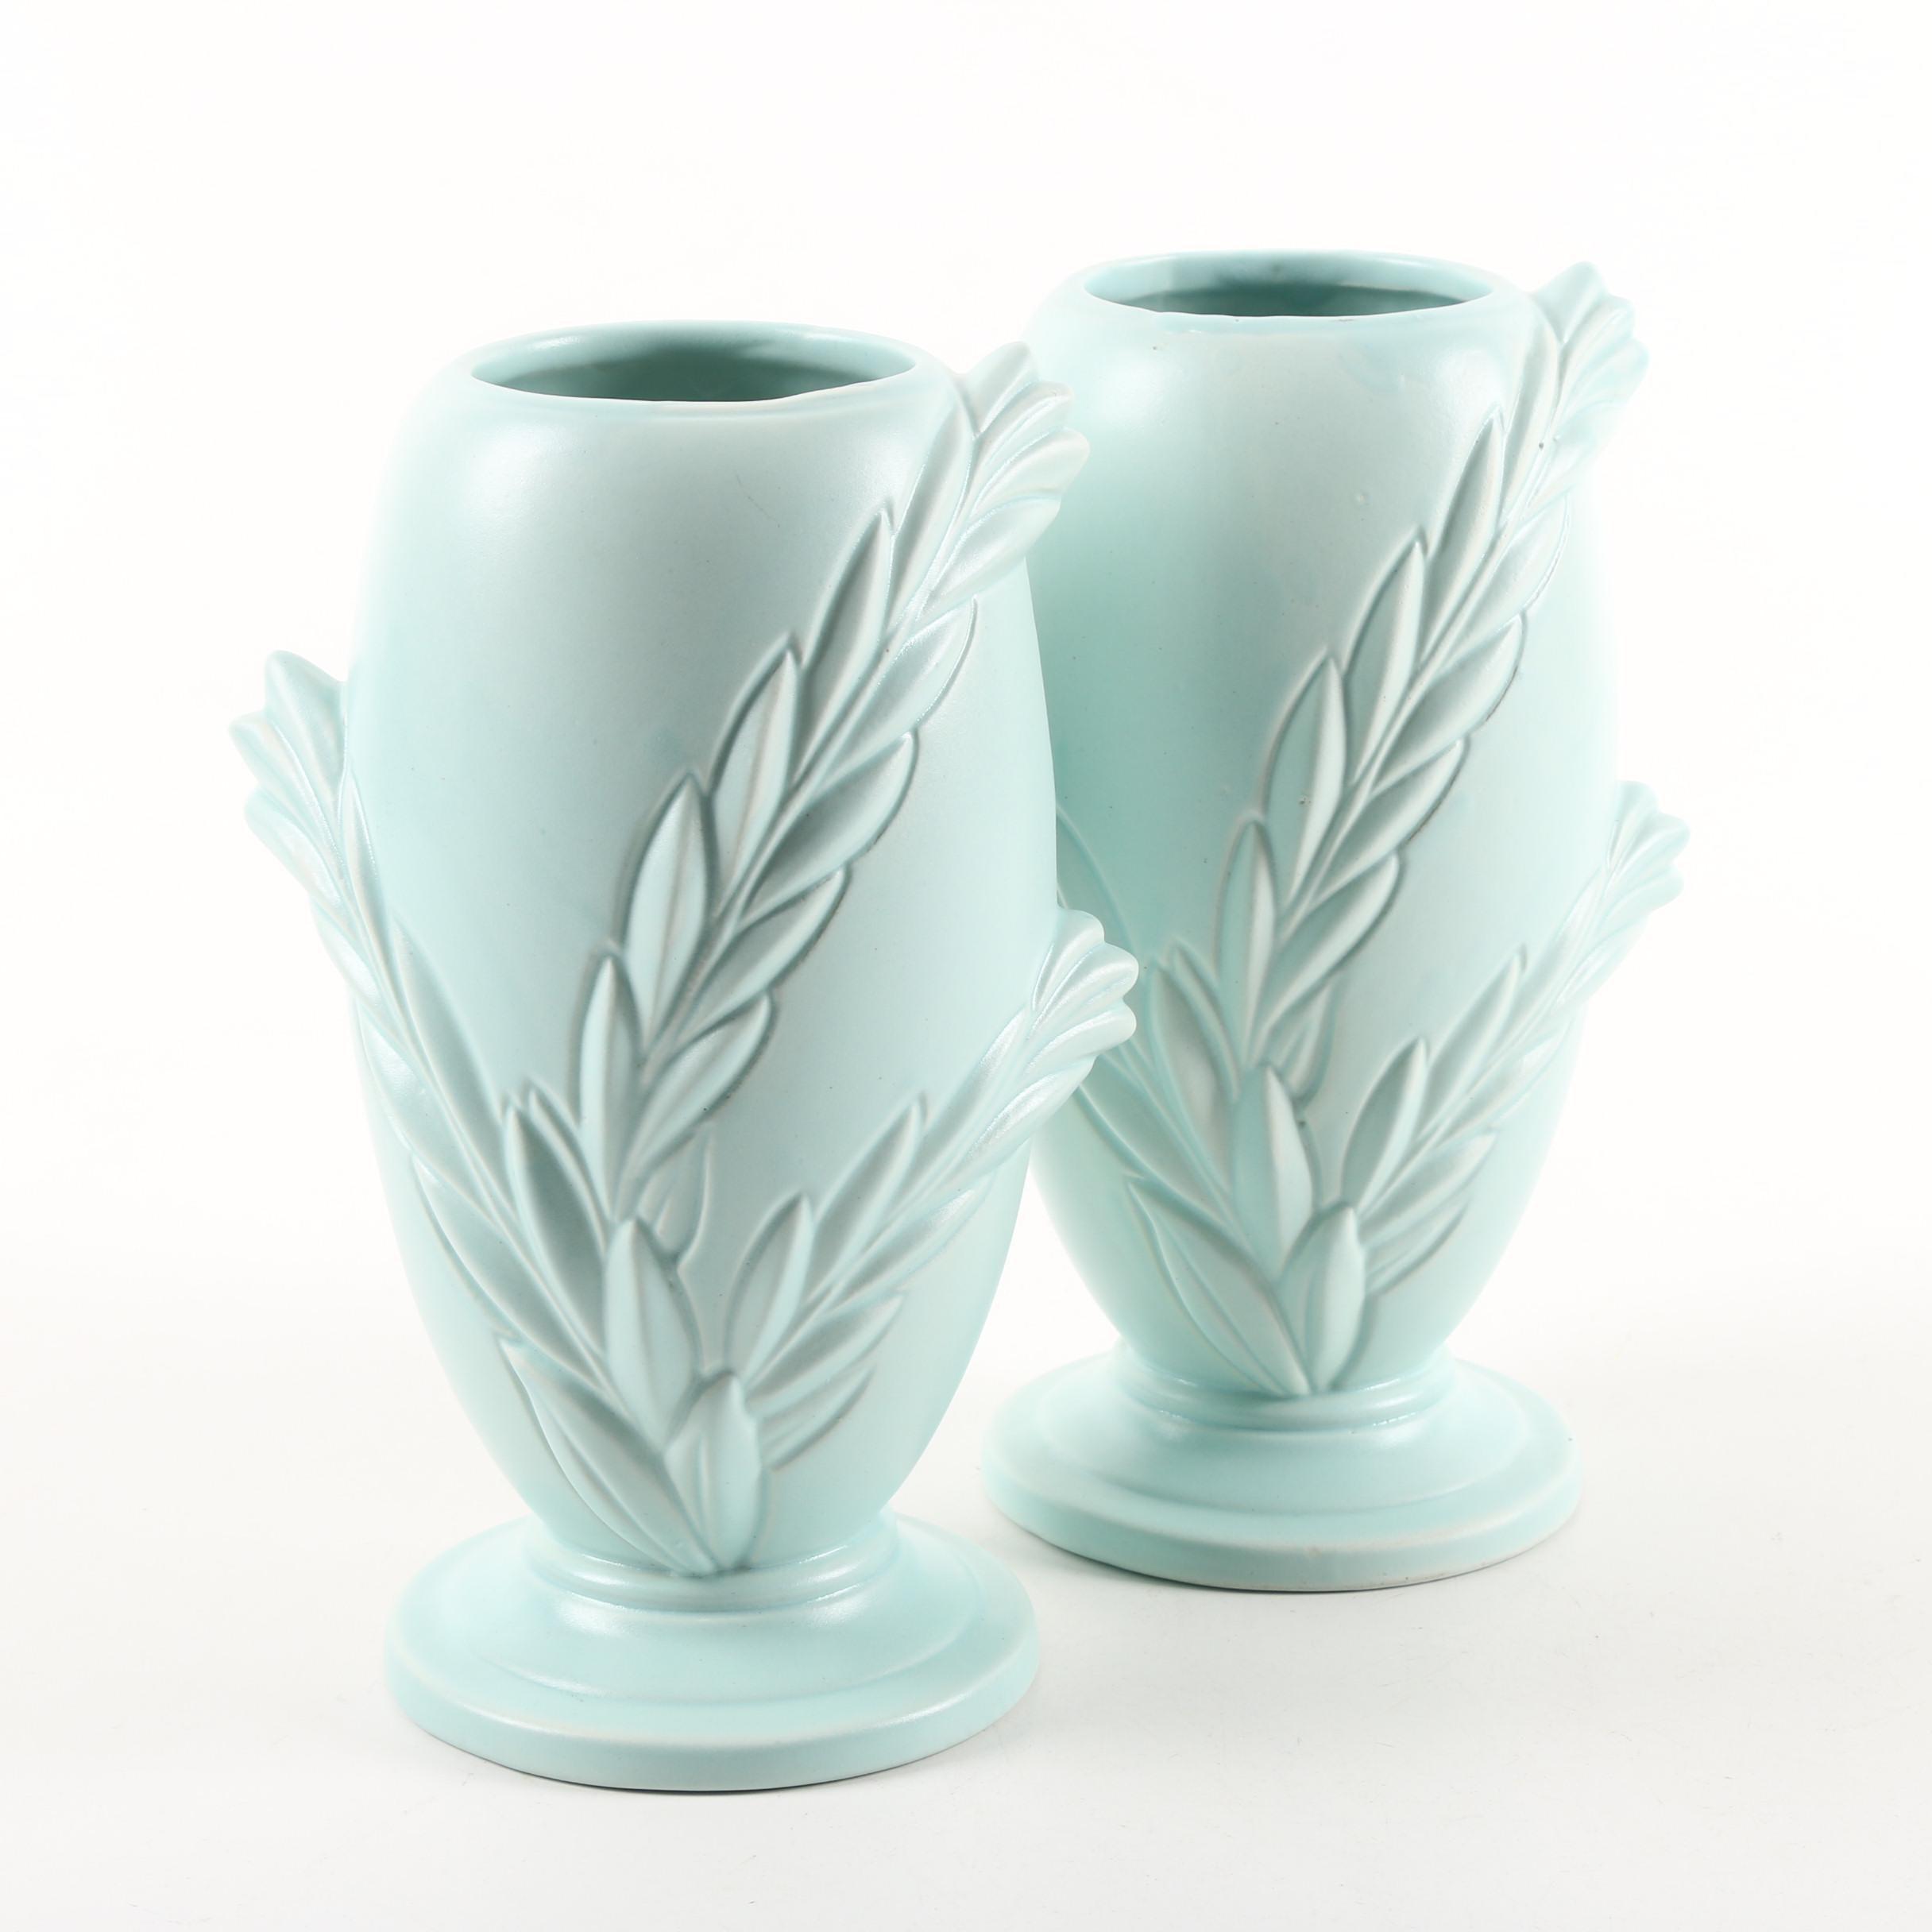 Vintage Haeger Pottery Vases